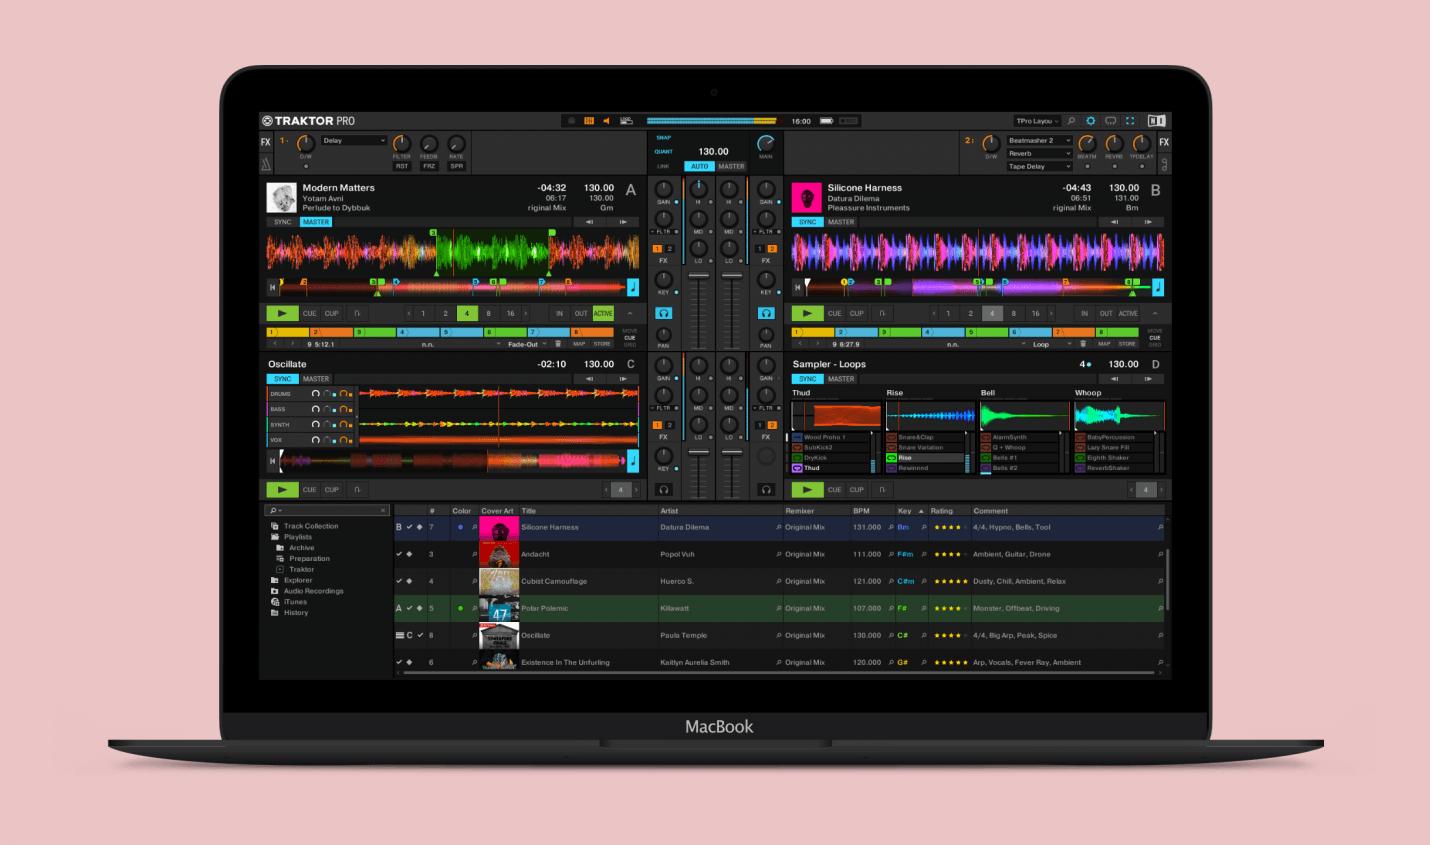 Update: Traktor Pro 3.2 bringt Features für Harmonic Mixing